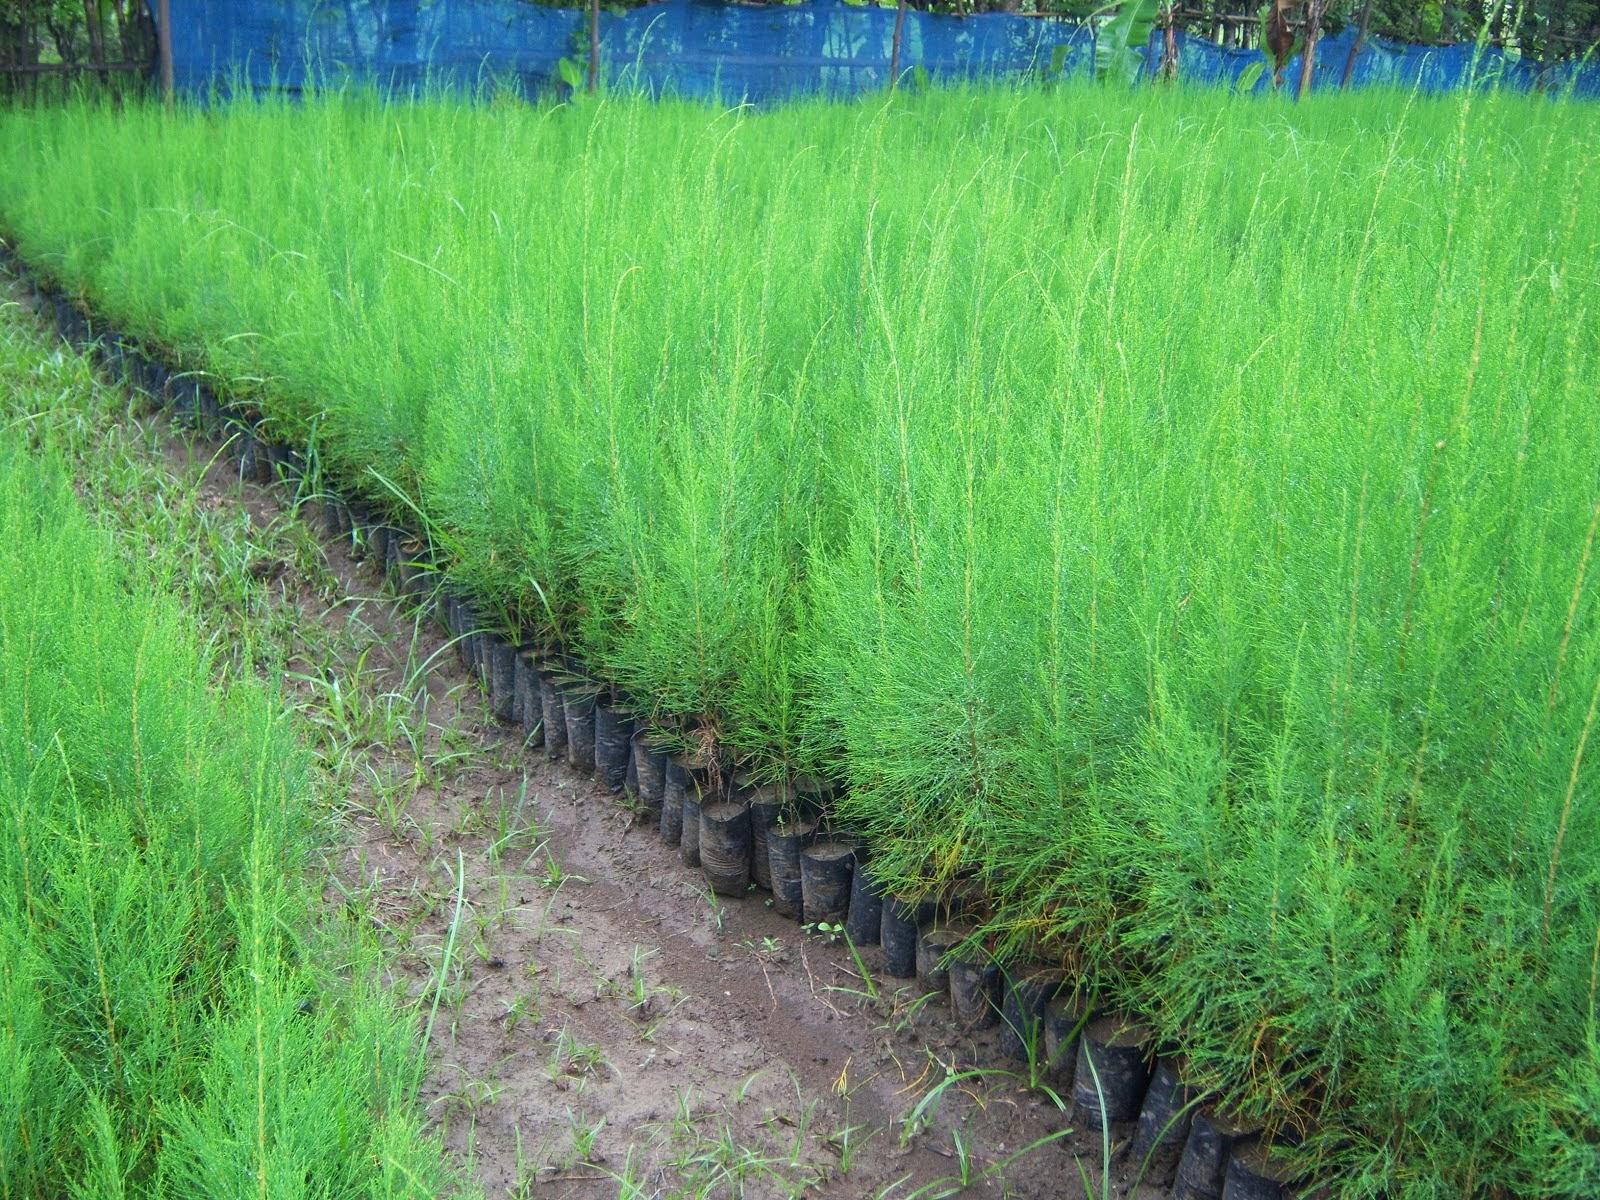 Jual pohon cemara angin | suplier tanaman | jasa desain taman